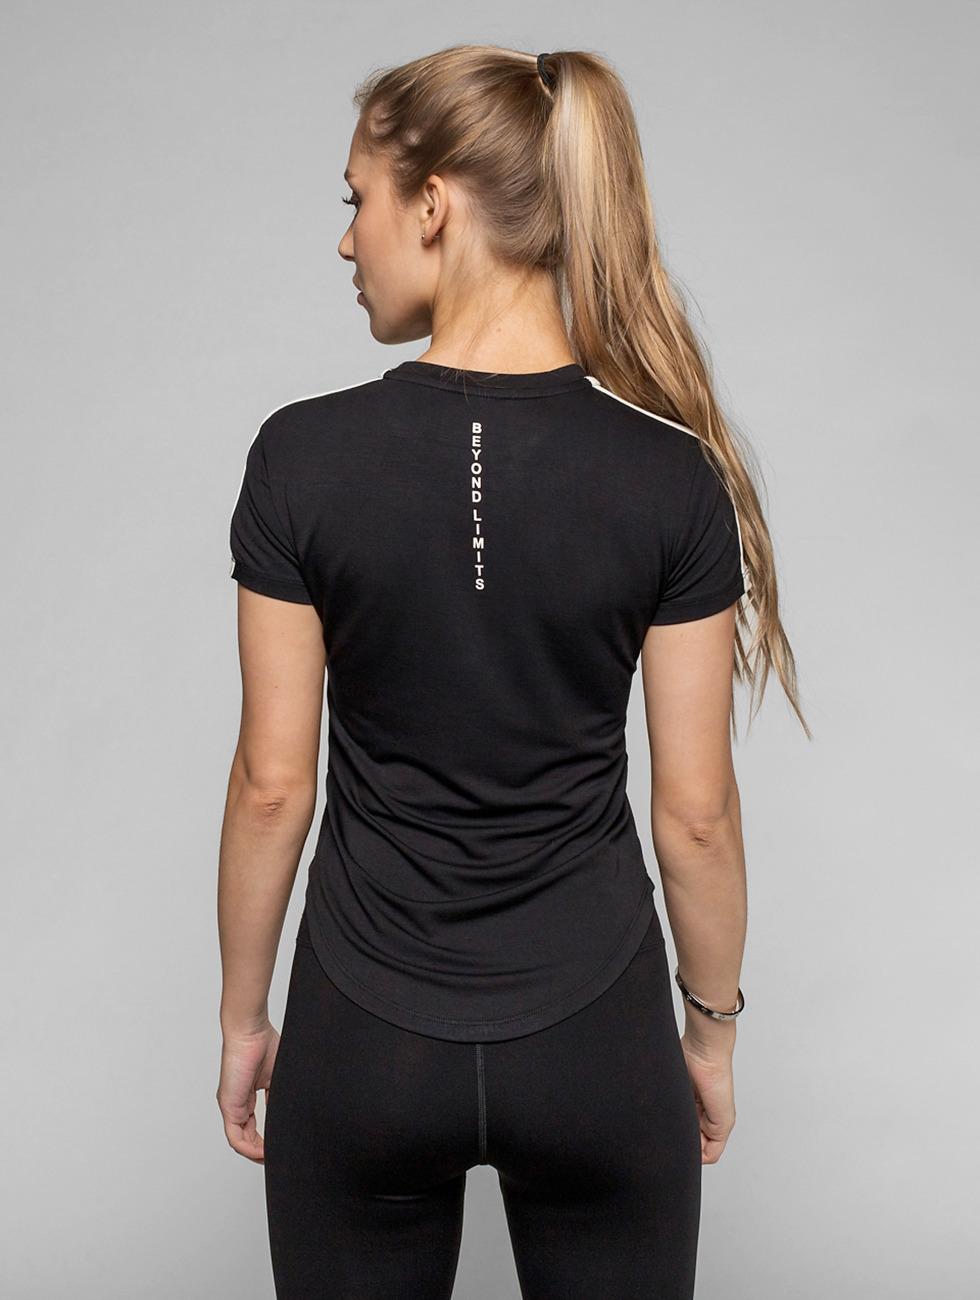 Beyond Limits Camiseta Statement negro